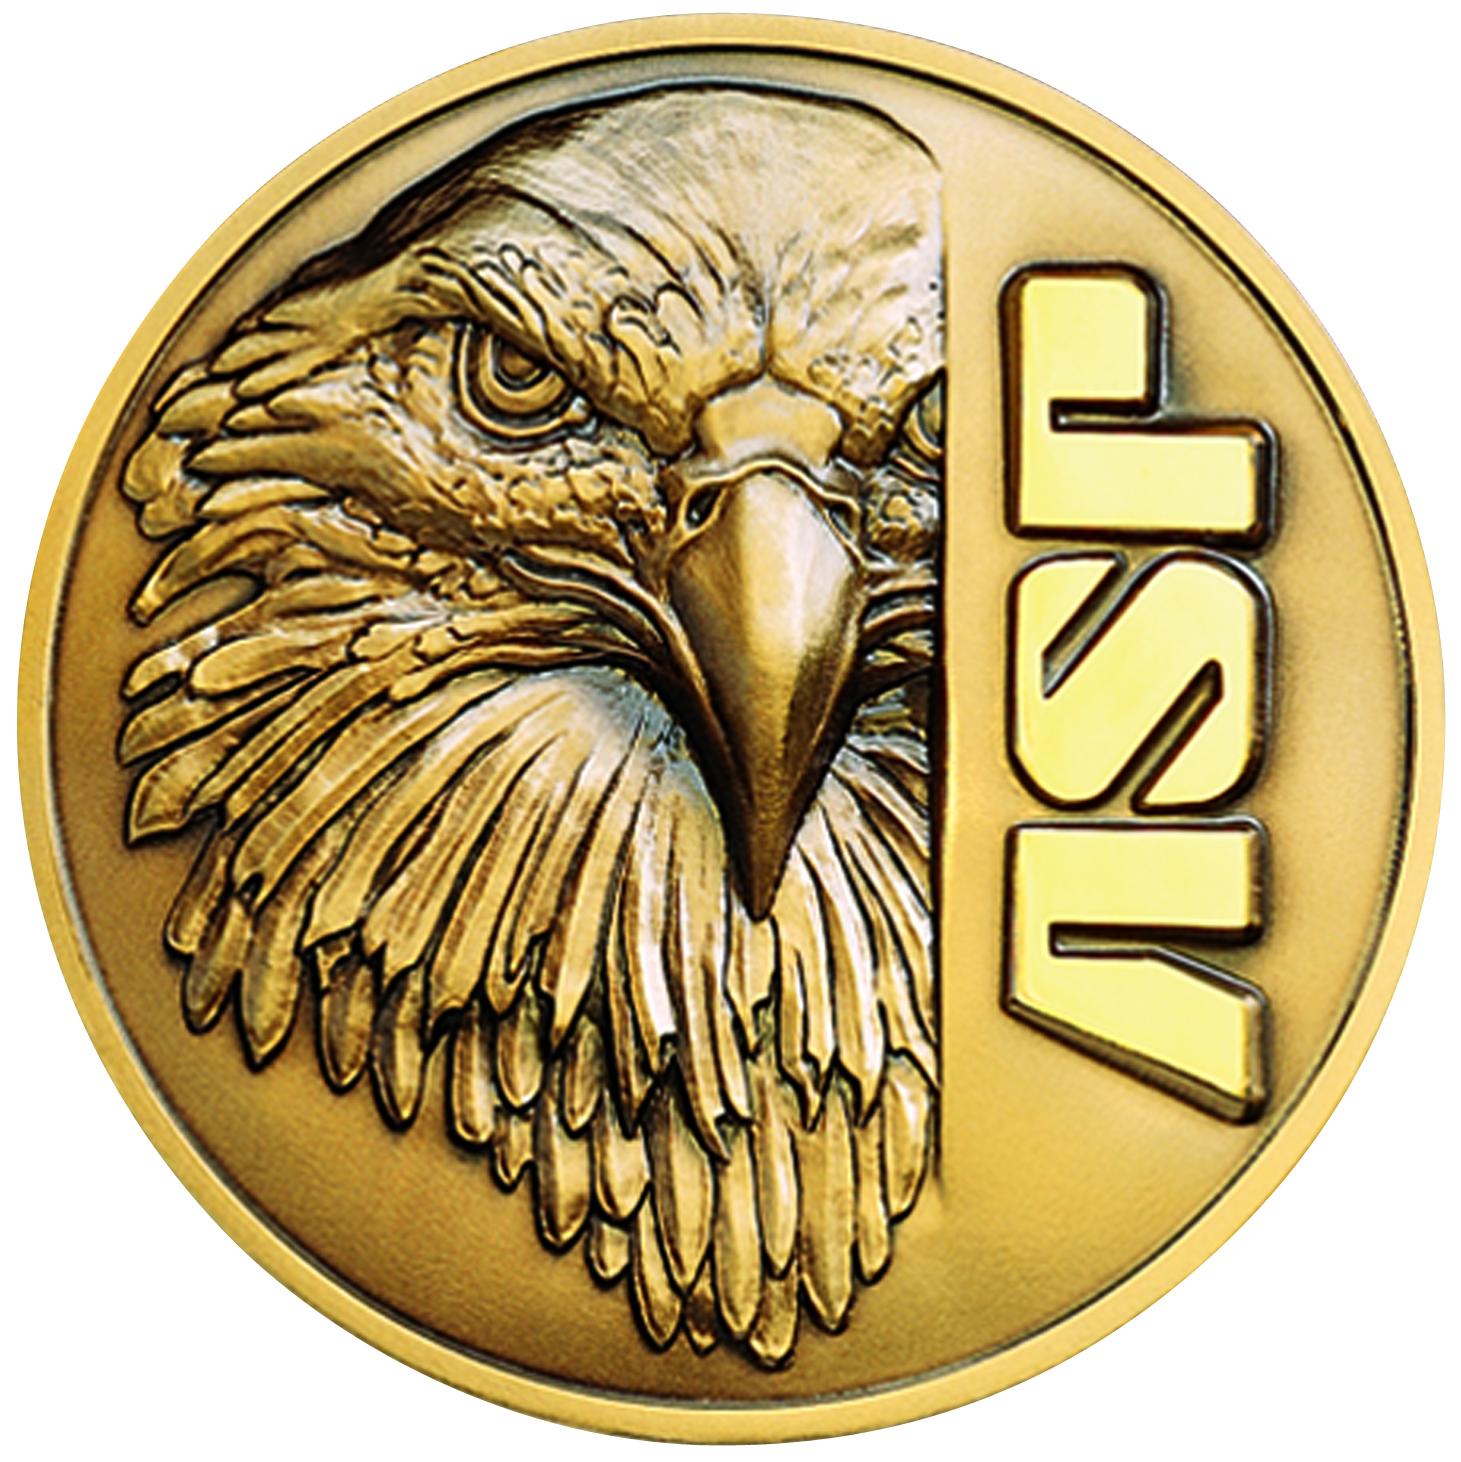 ASP_Eagle_Medallion_04_Inches_Wide.jpg